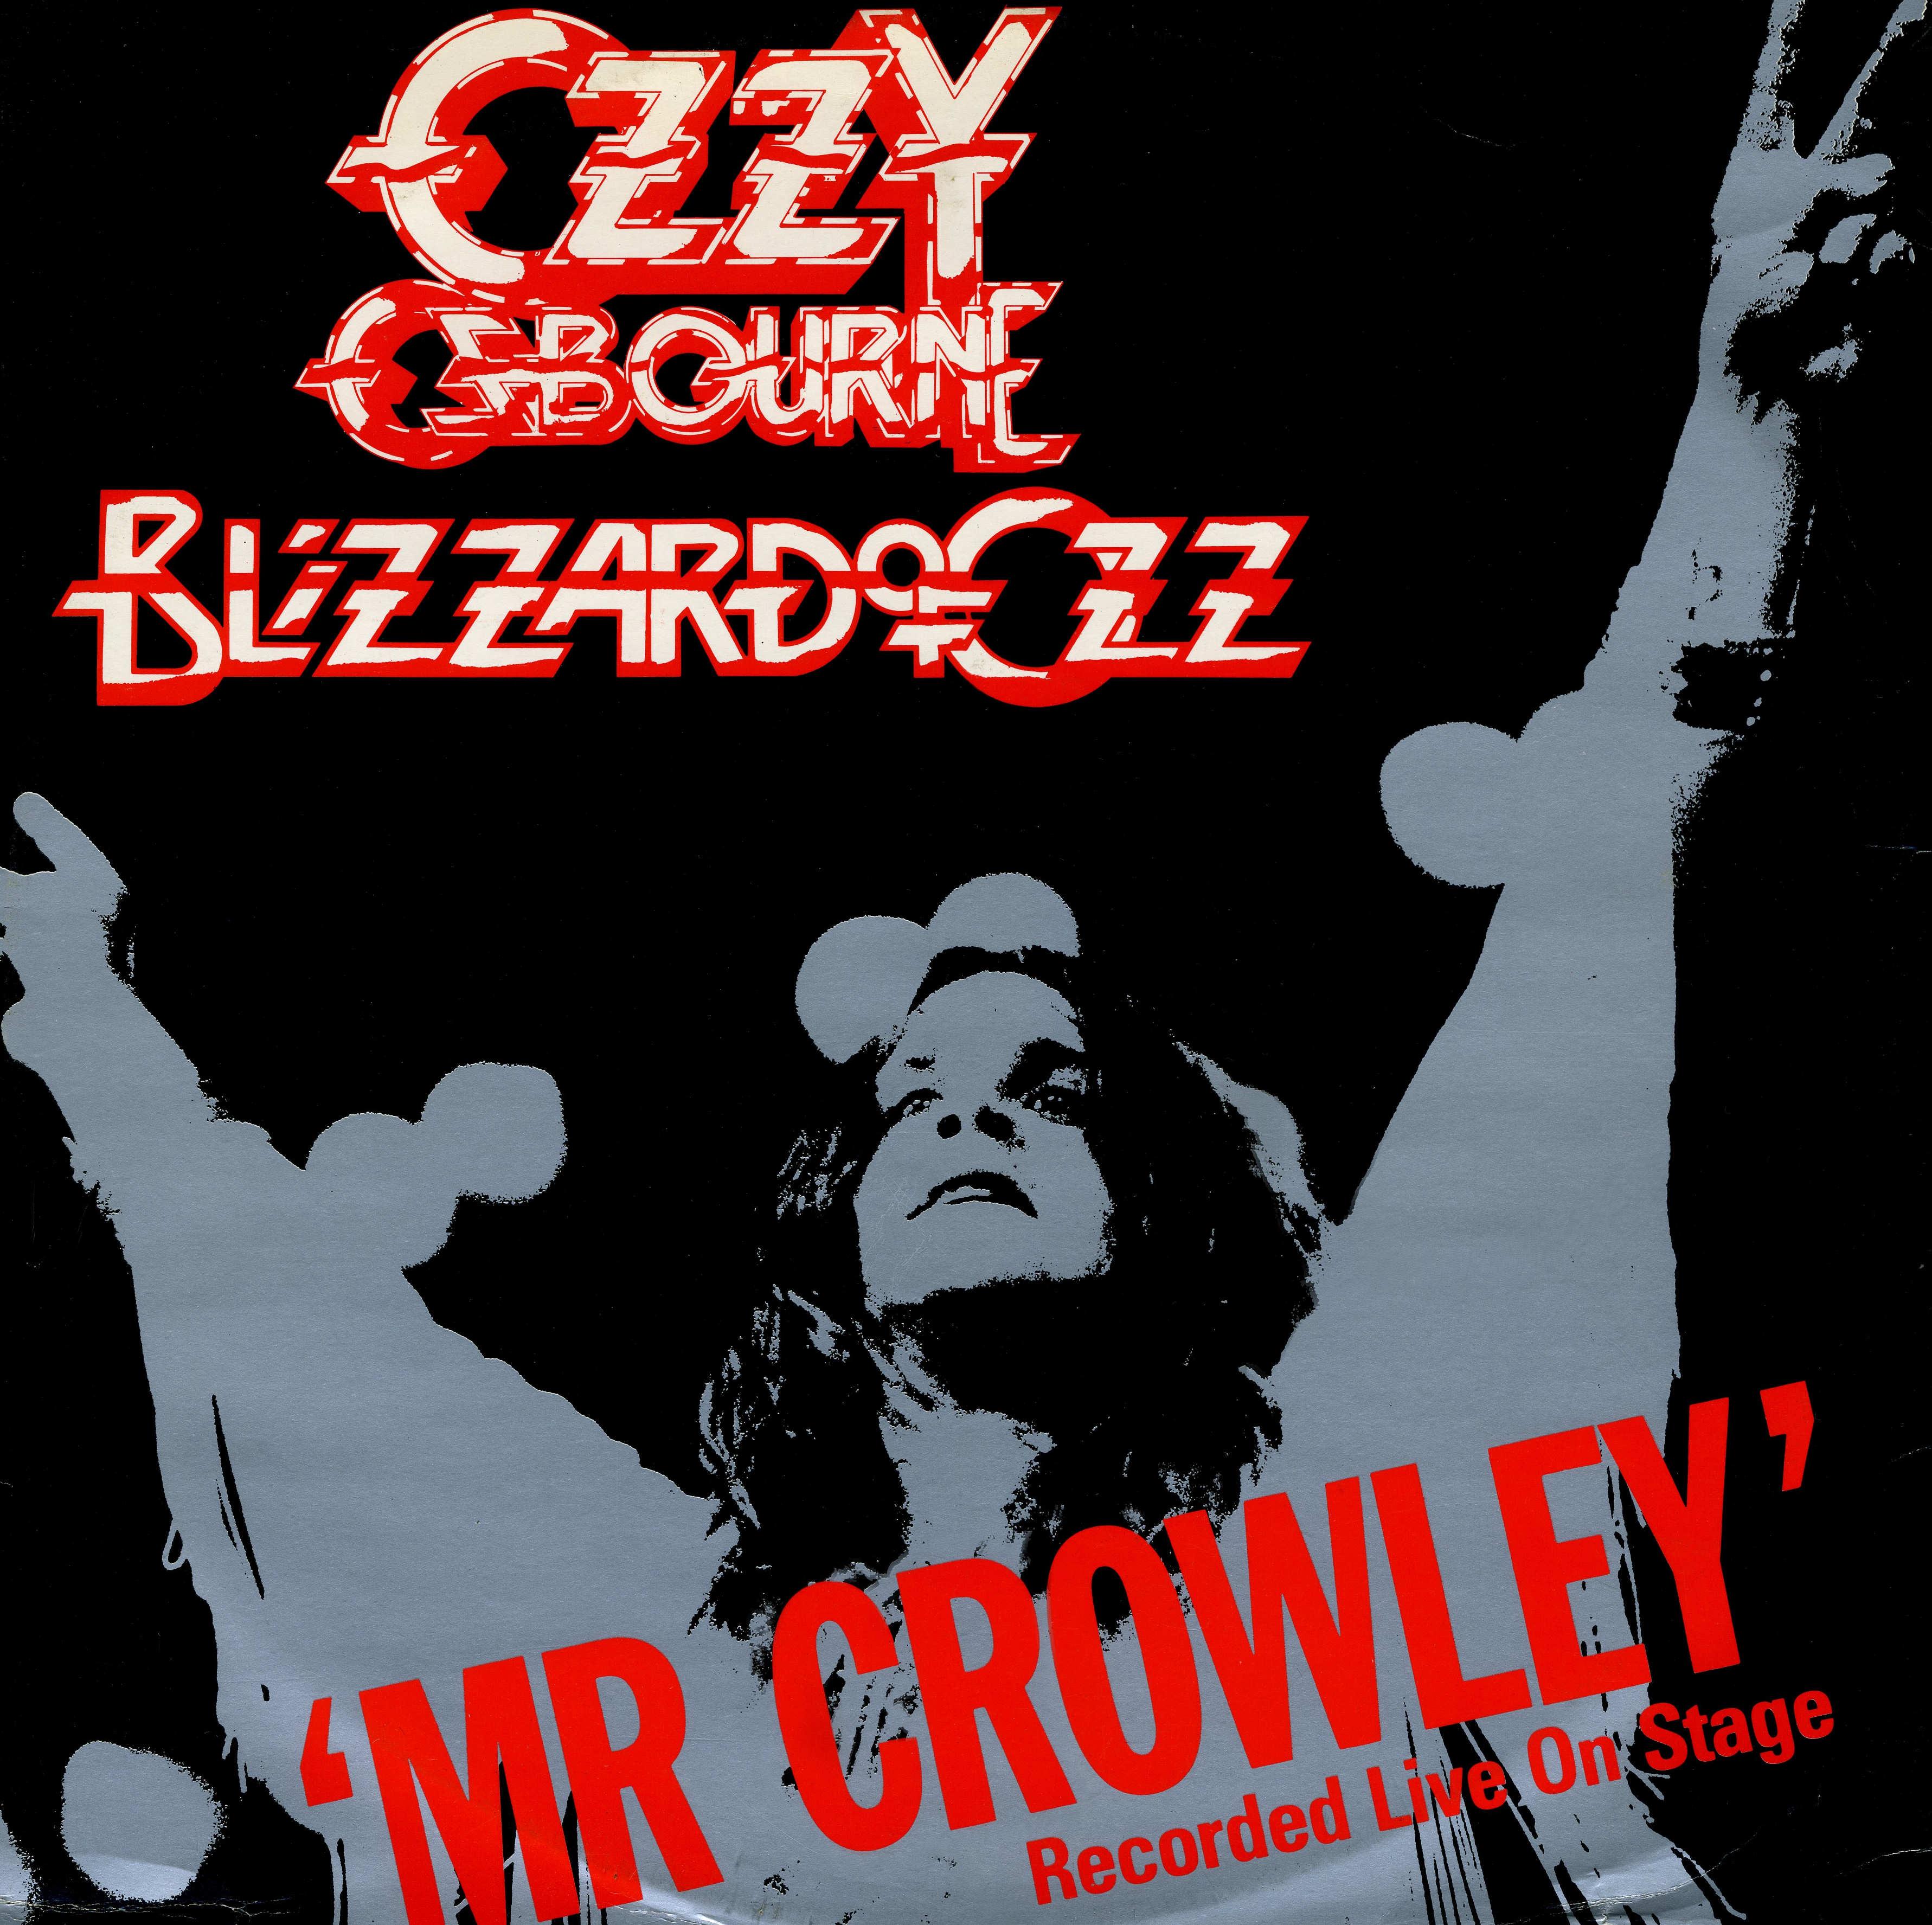 coversboxsk ozzy osbourne mr crowley vinyl